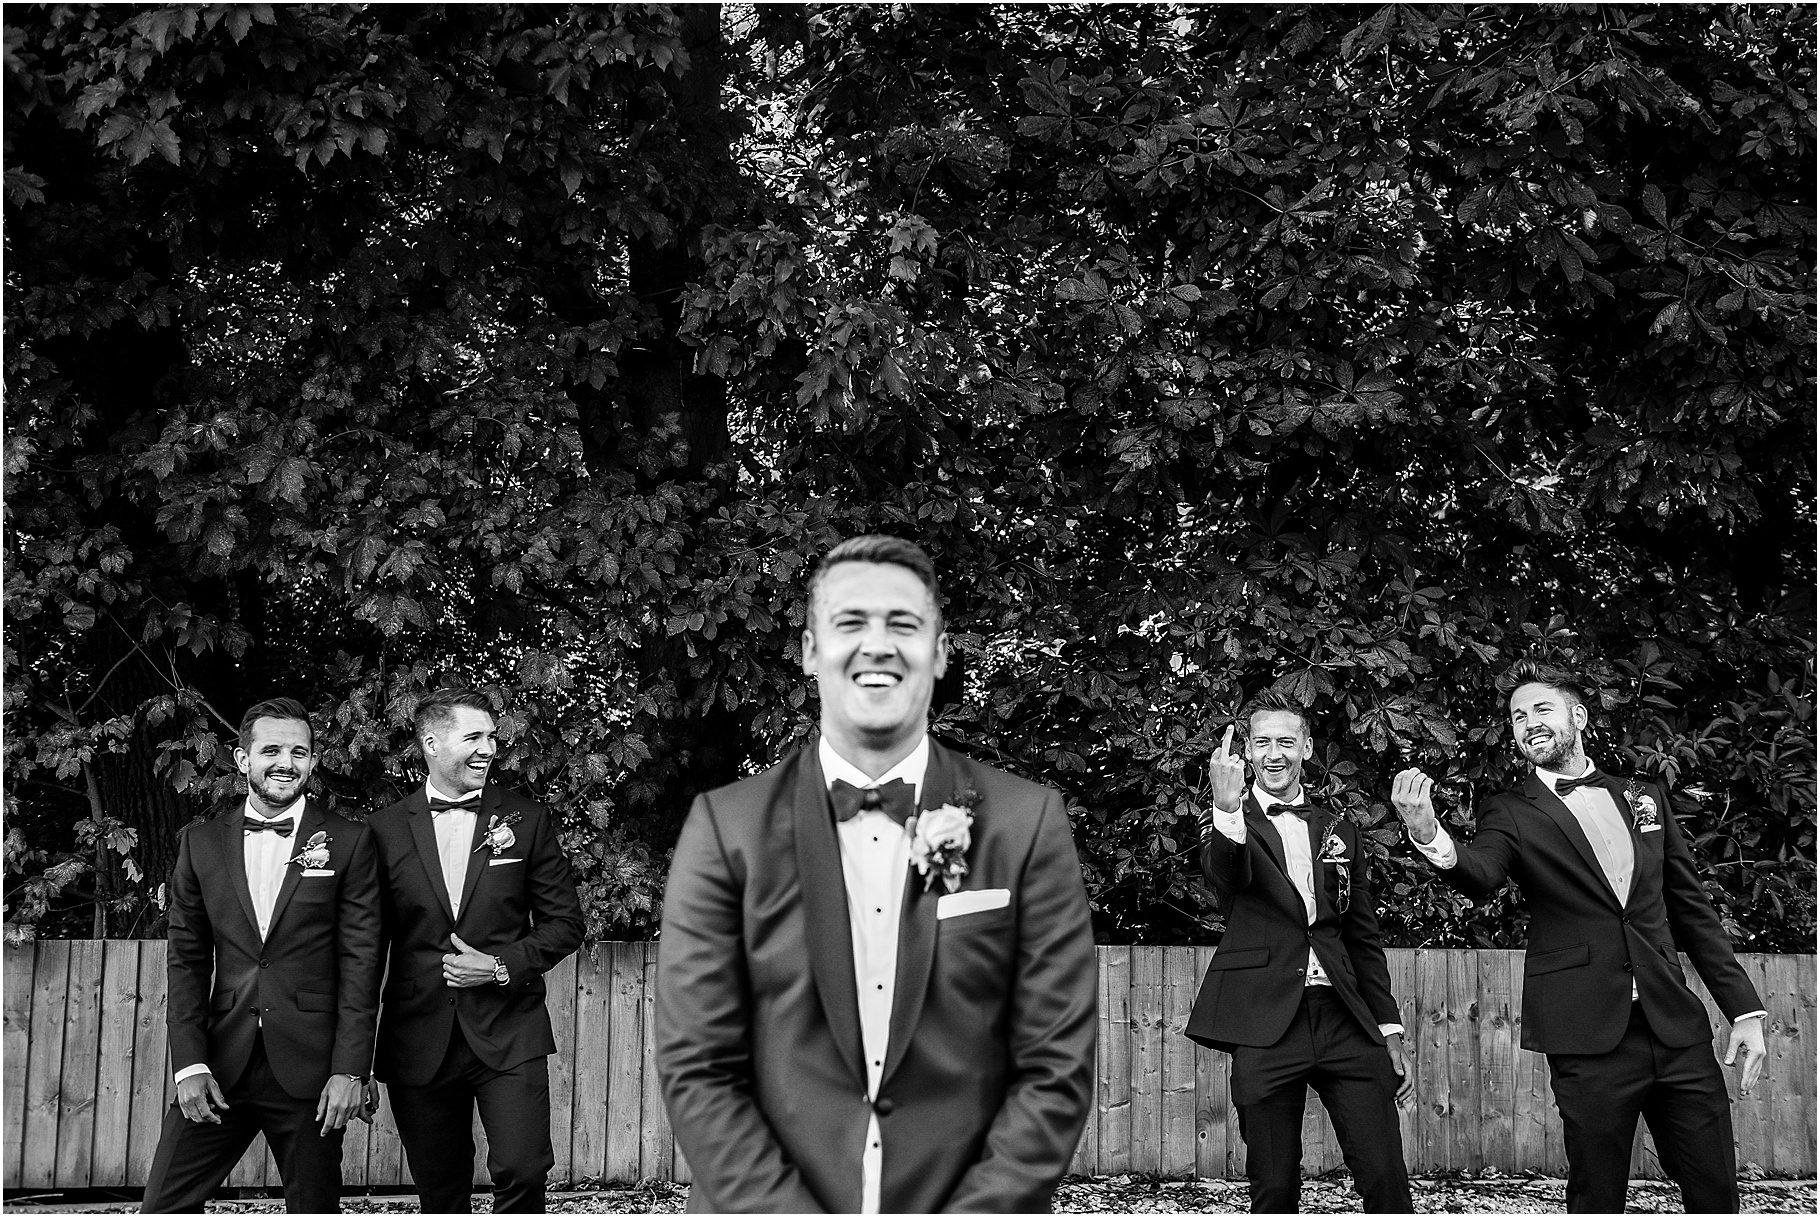 dan-wootton-photography-2017-weddings-067.jpg